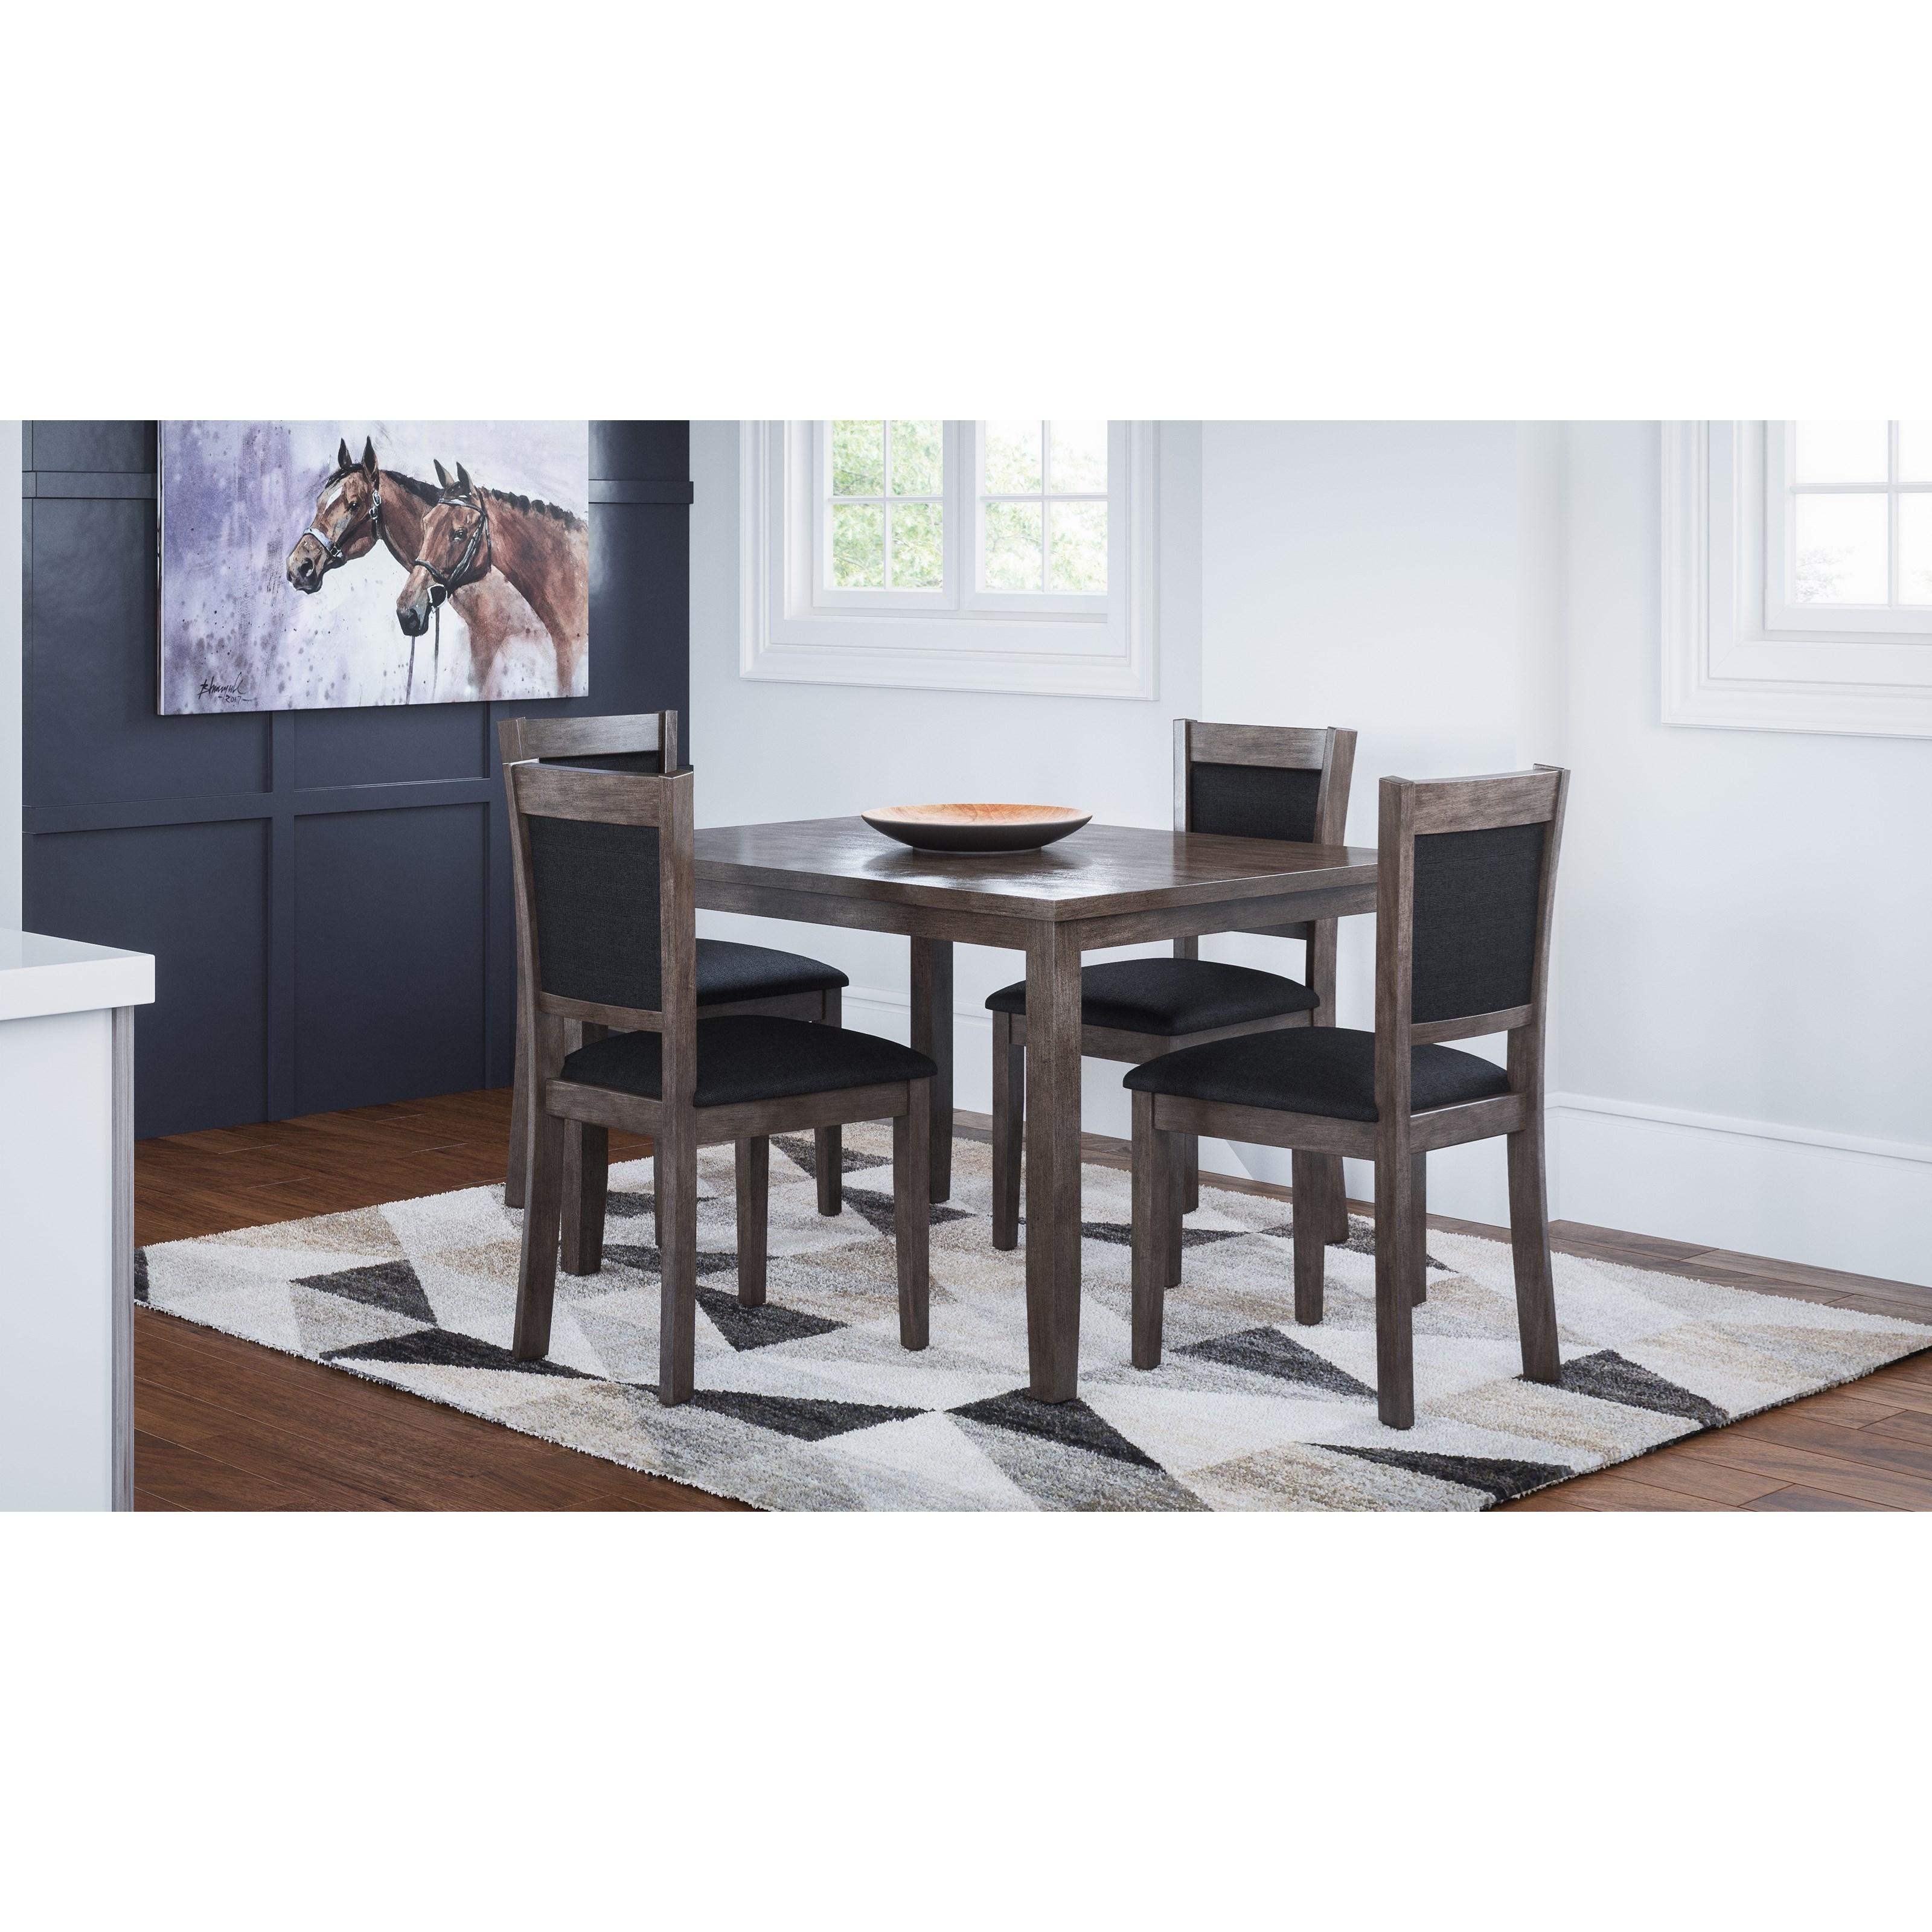 Braden Braden 5-Piece Dining Table Set by Jofran at Morris Home